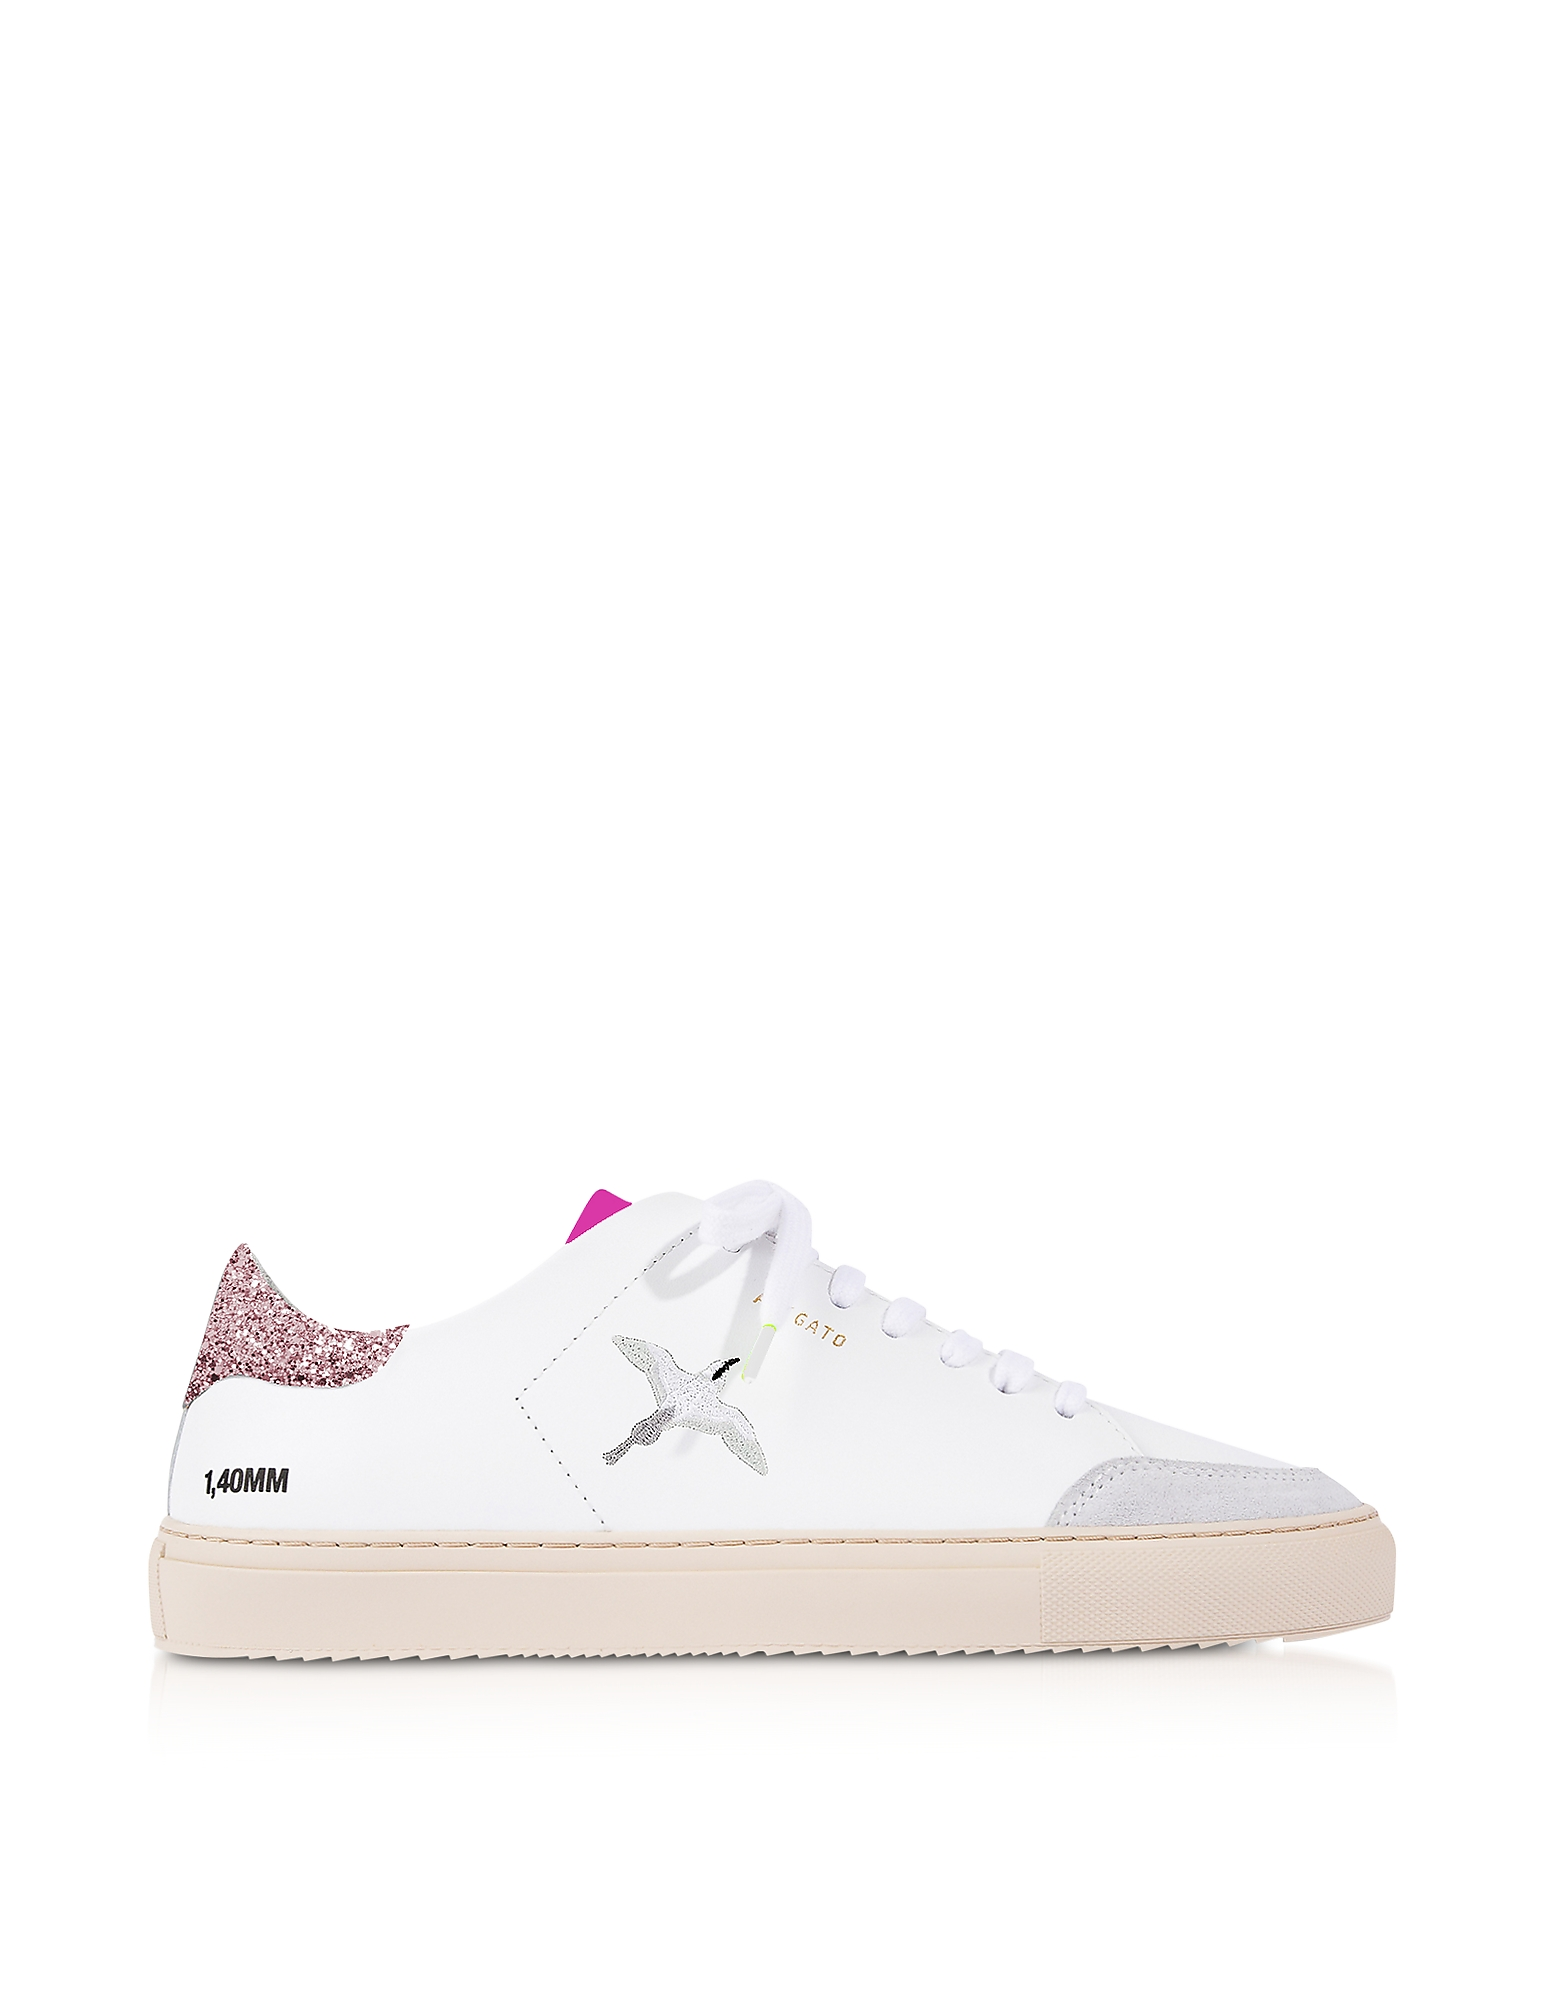 Clean 90 Triple Bird White, Pink Glitter & Fuchsia Leather Women's Sneakers